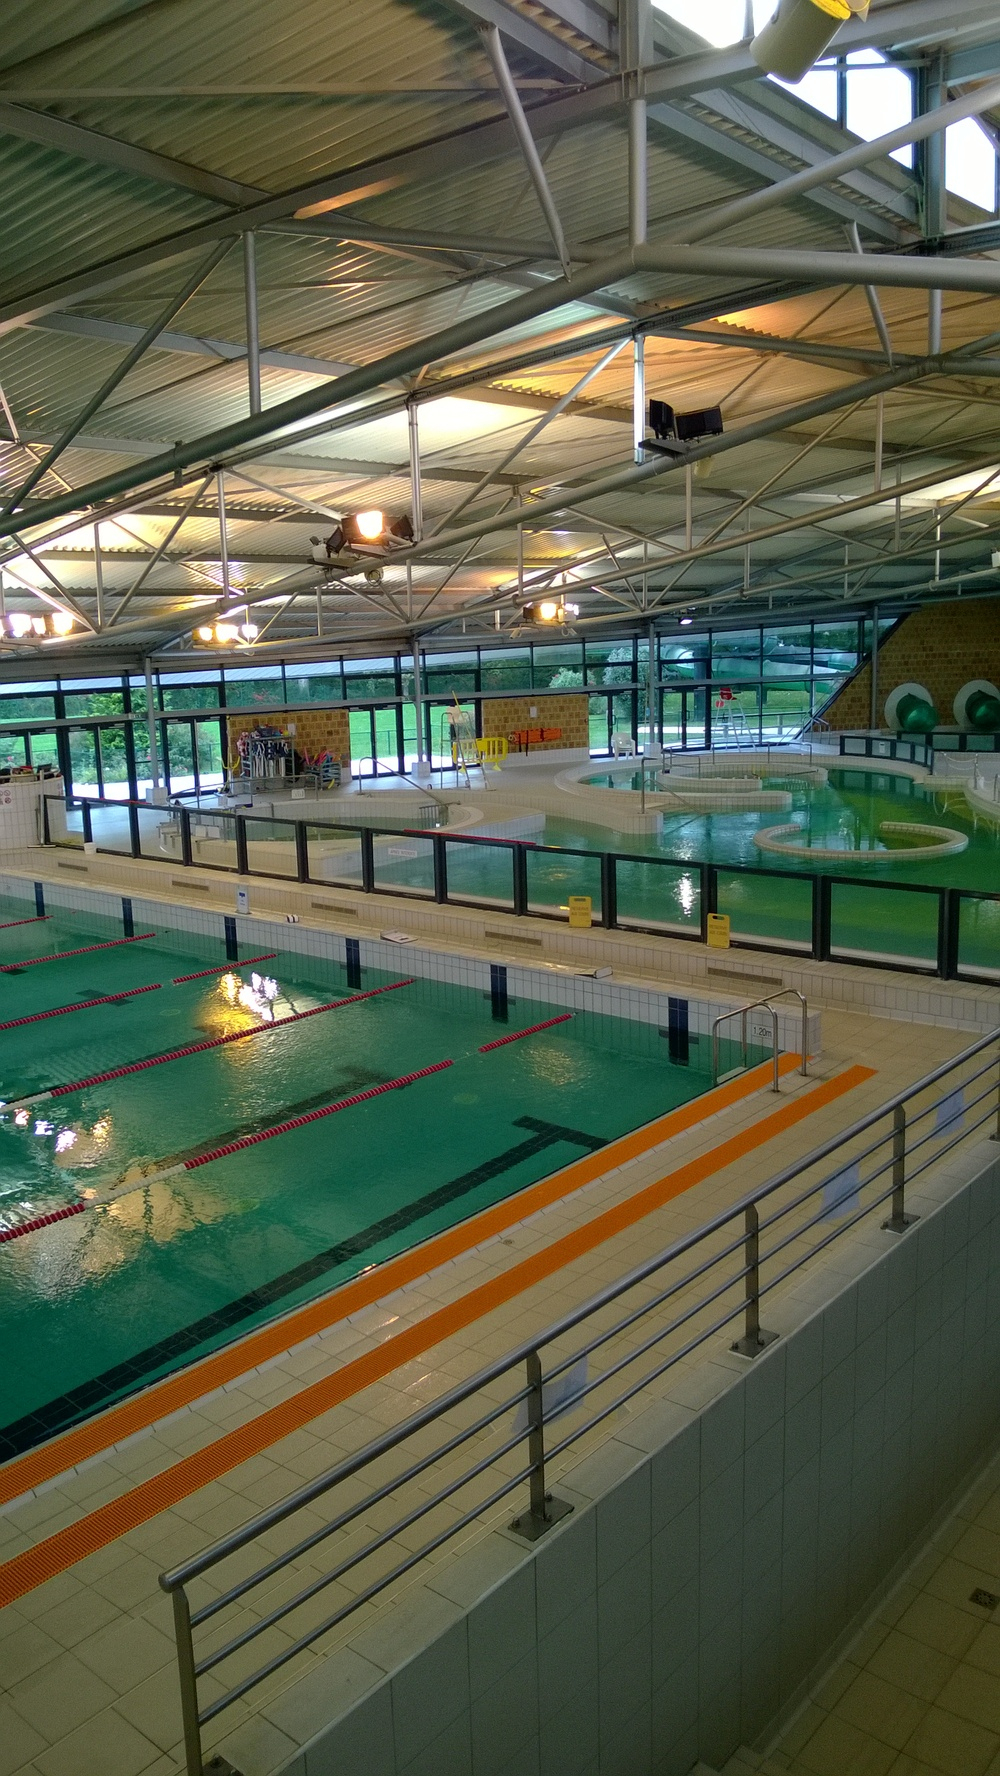 Séances Centre Aquatique De Montigny Le Bretonneux - Page 1 ... à Piscine Montigny Le Bretonneux